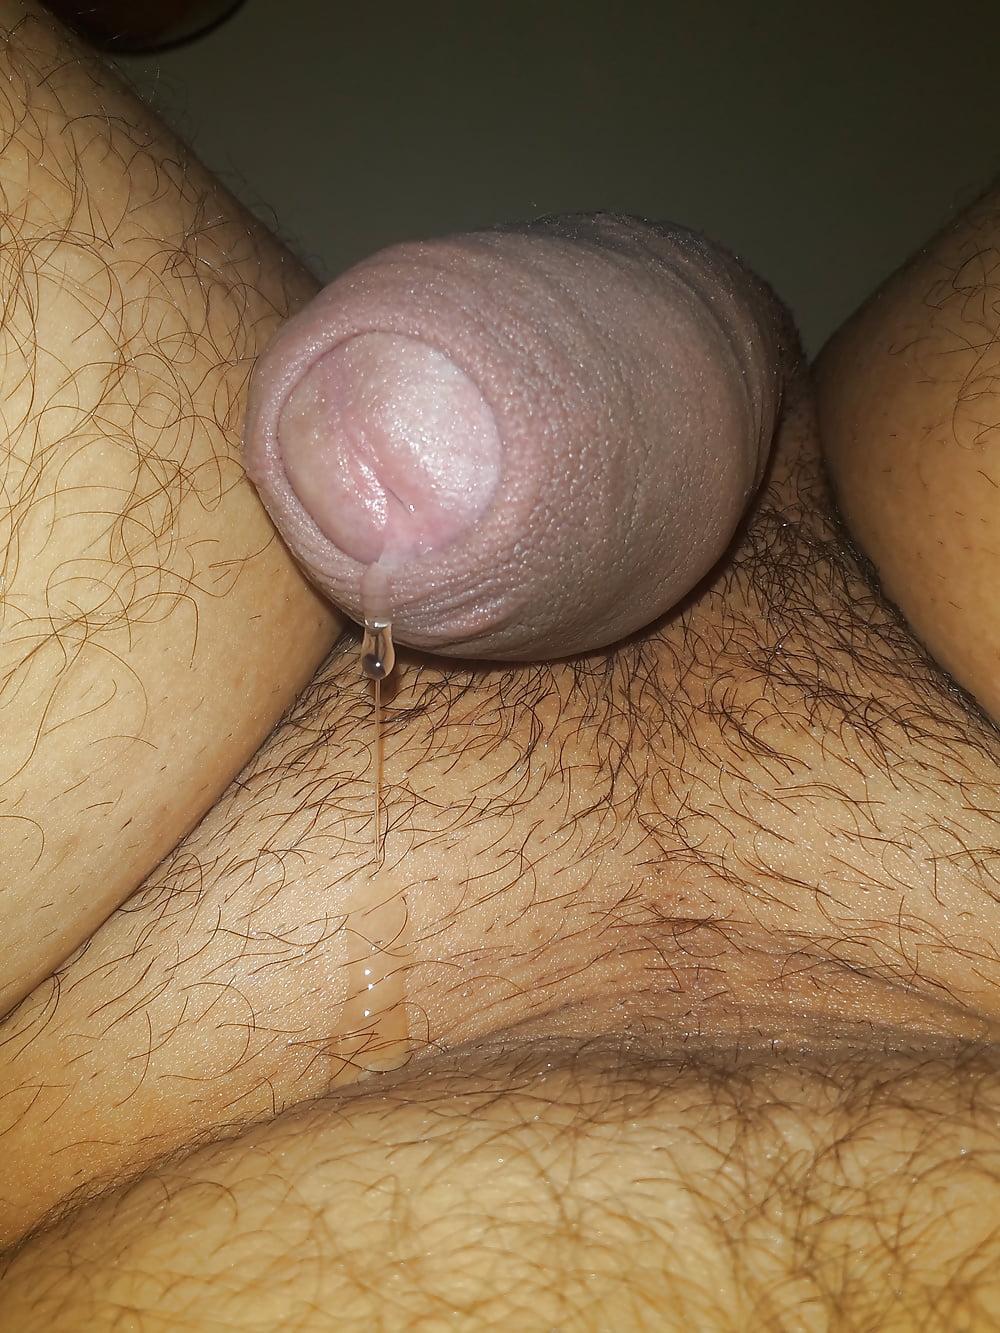 and-orange-dripping-wet-cock-africa-boy